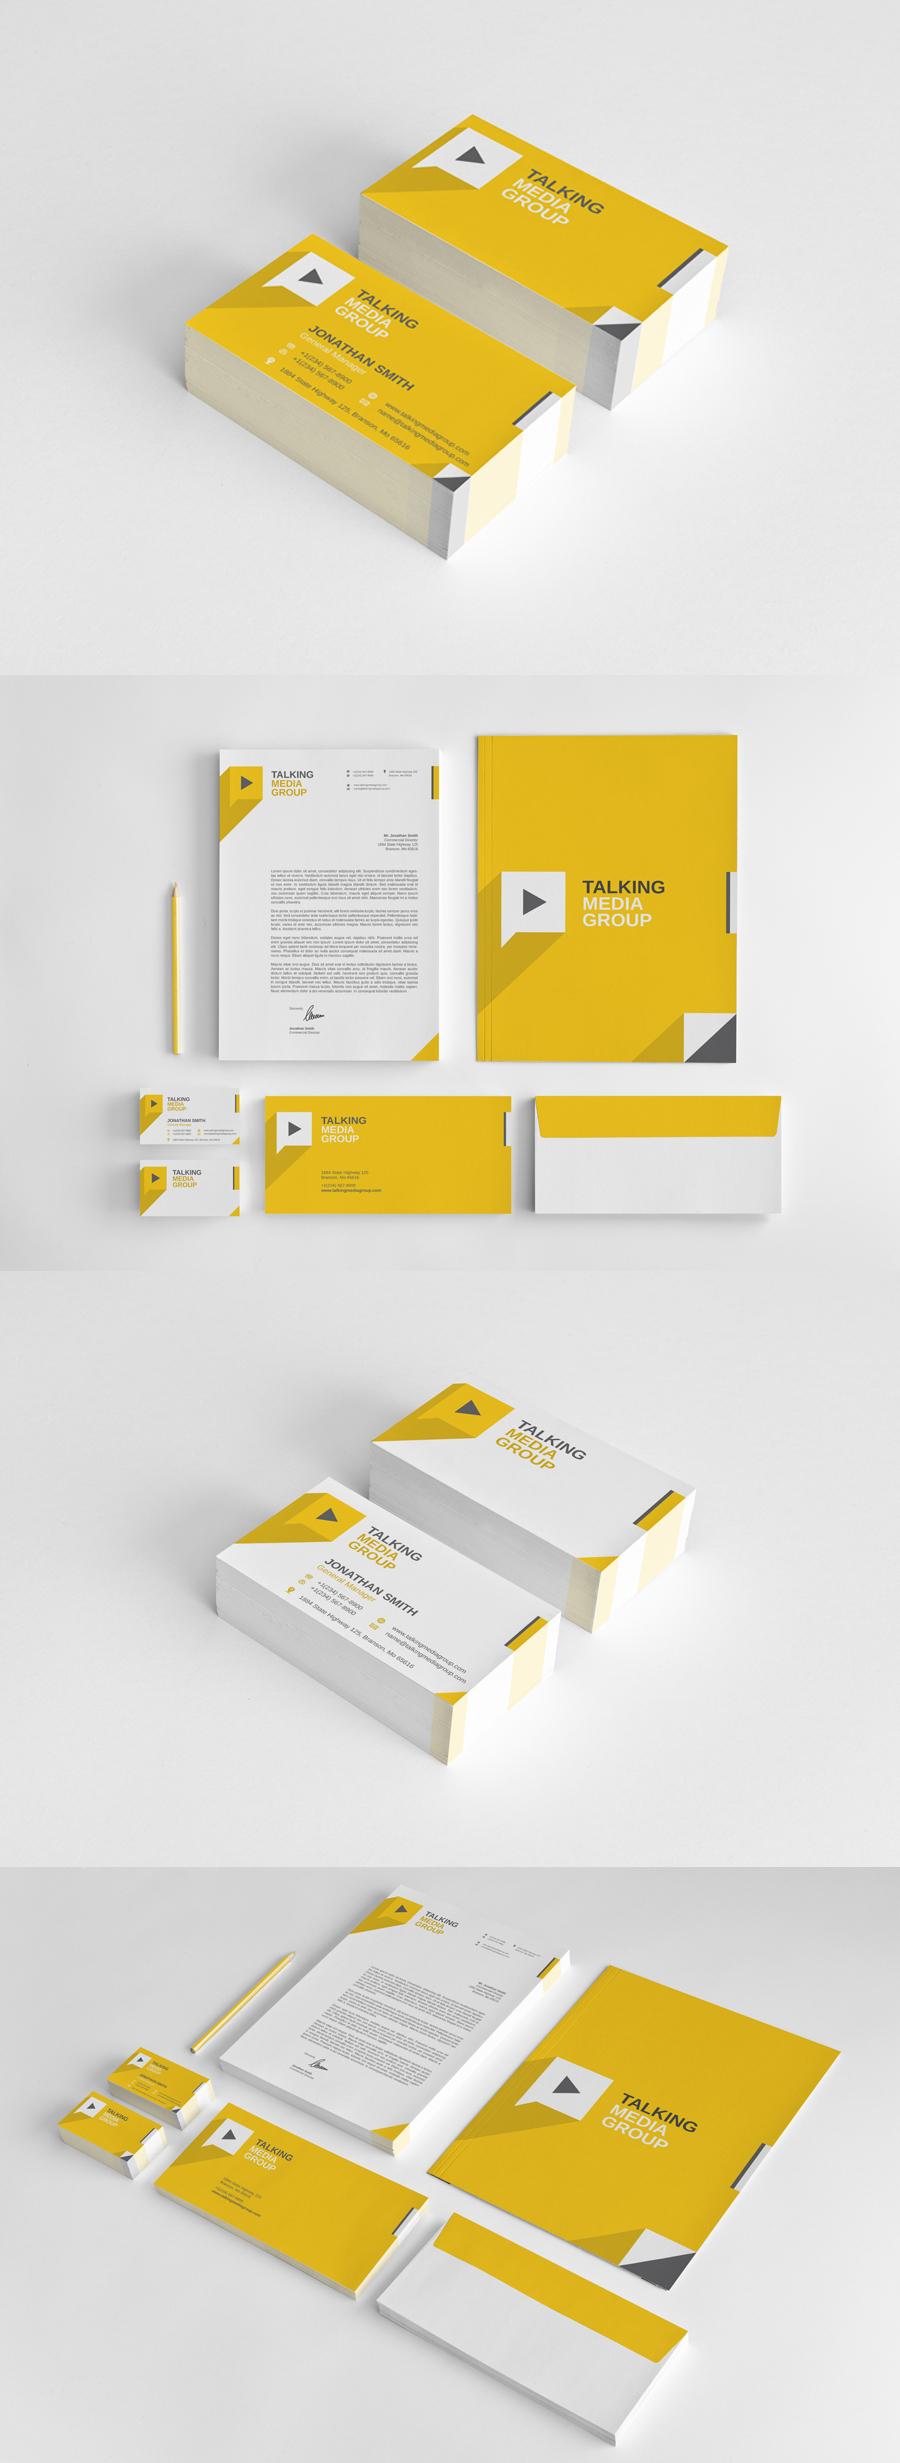 Flat Corporate Stationery vol.1 by nazdrag